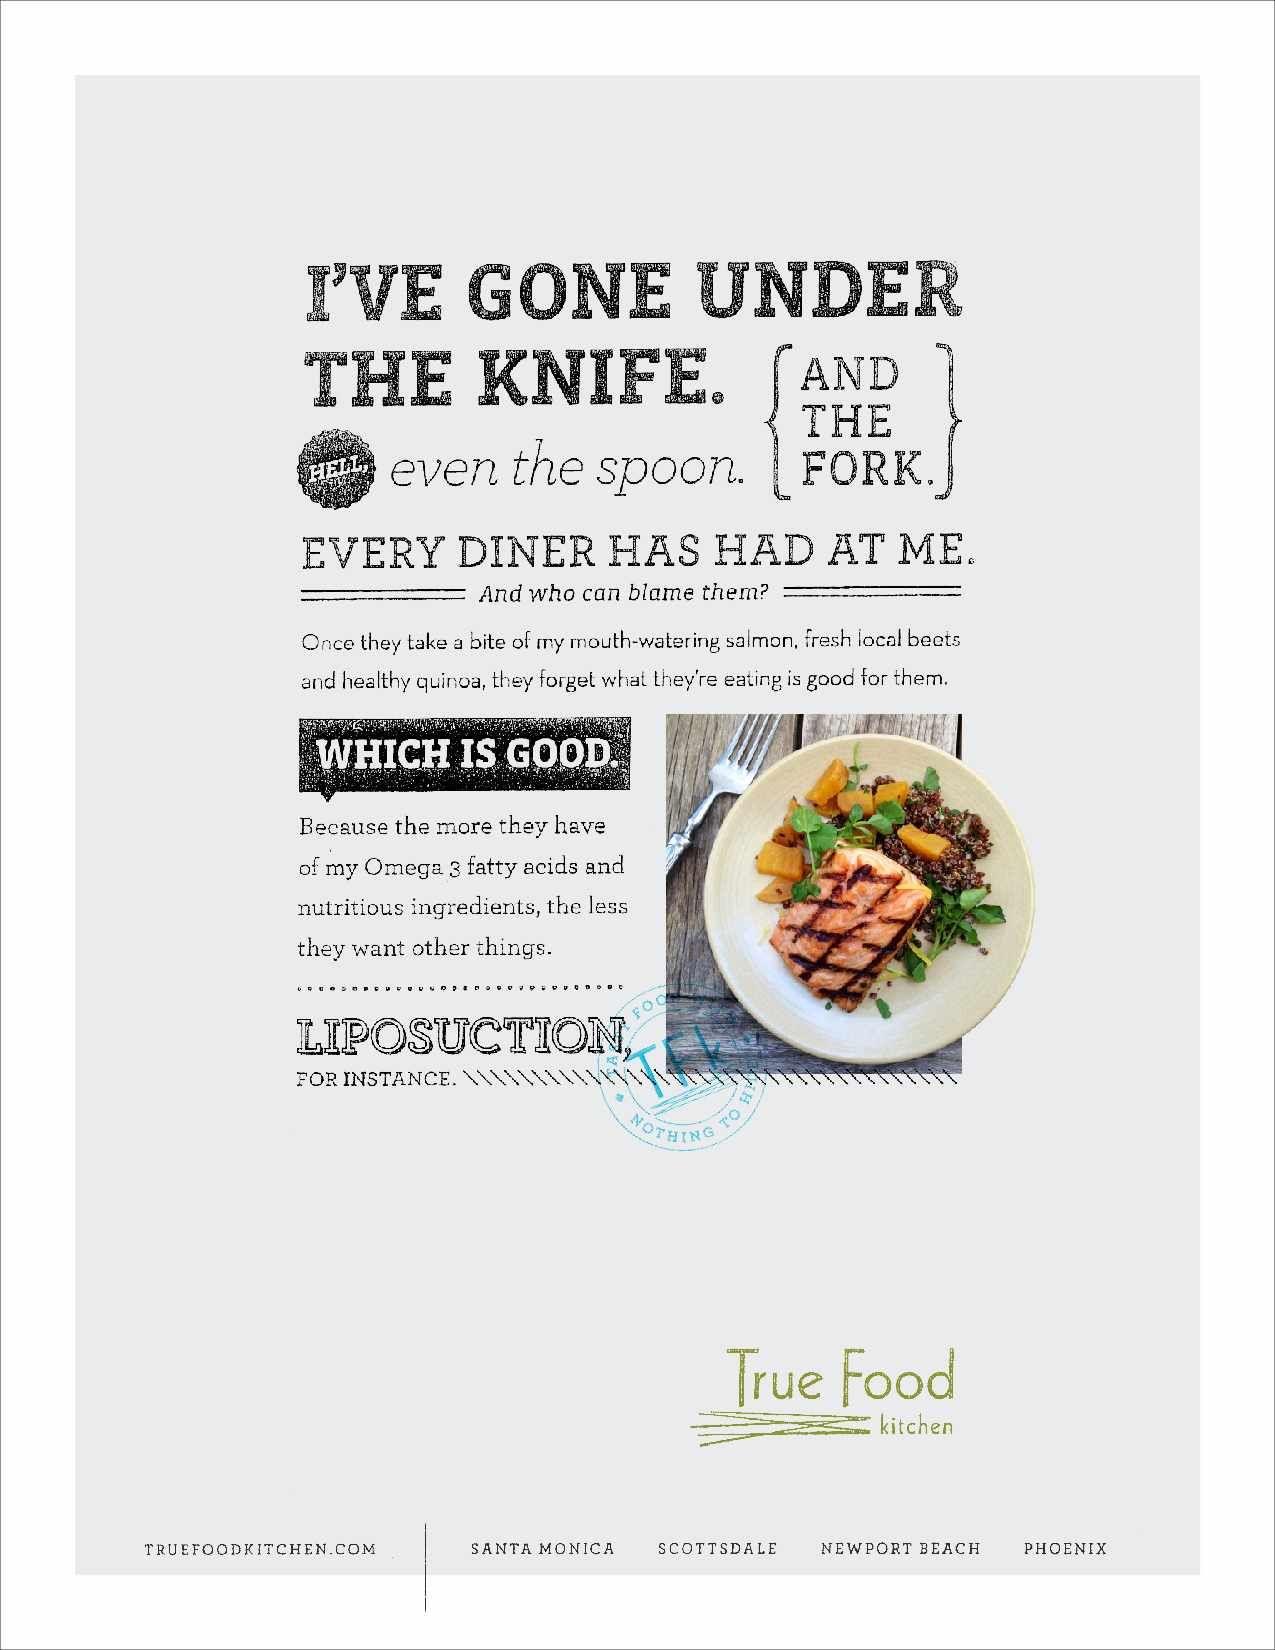 True food kitchen salmon advertising pinterest true food true food kitchen salmon forumfinder Gallery